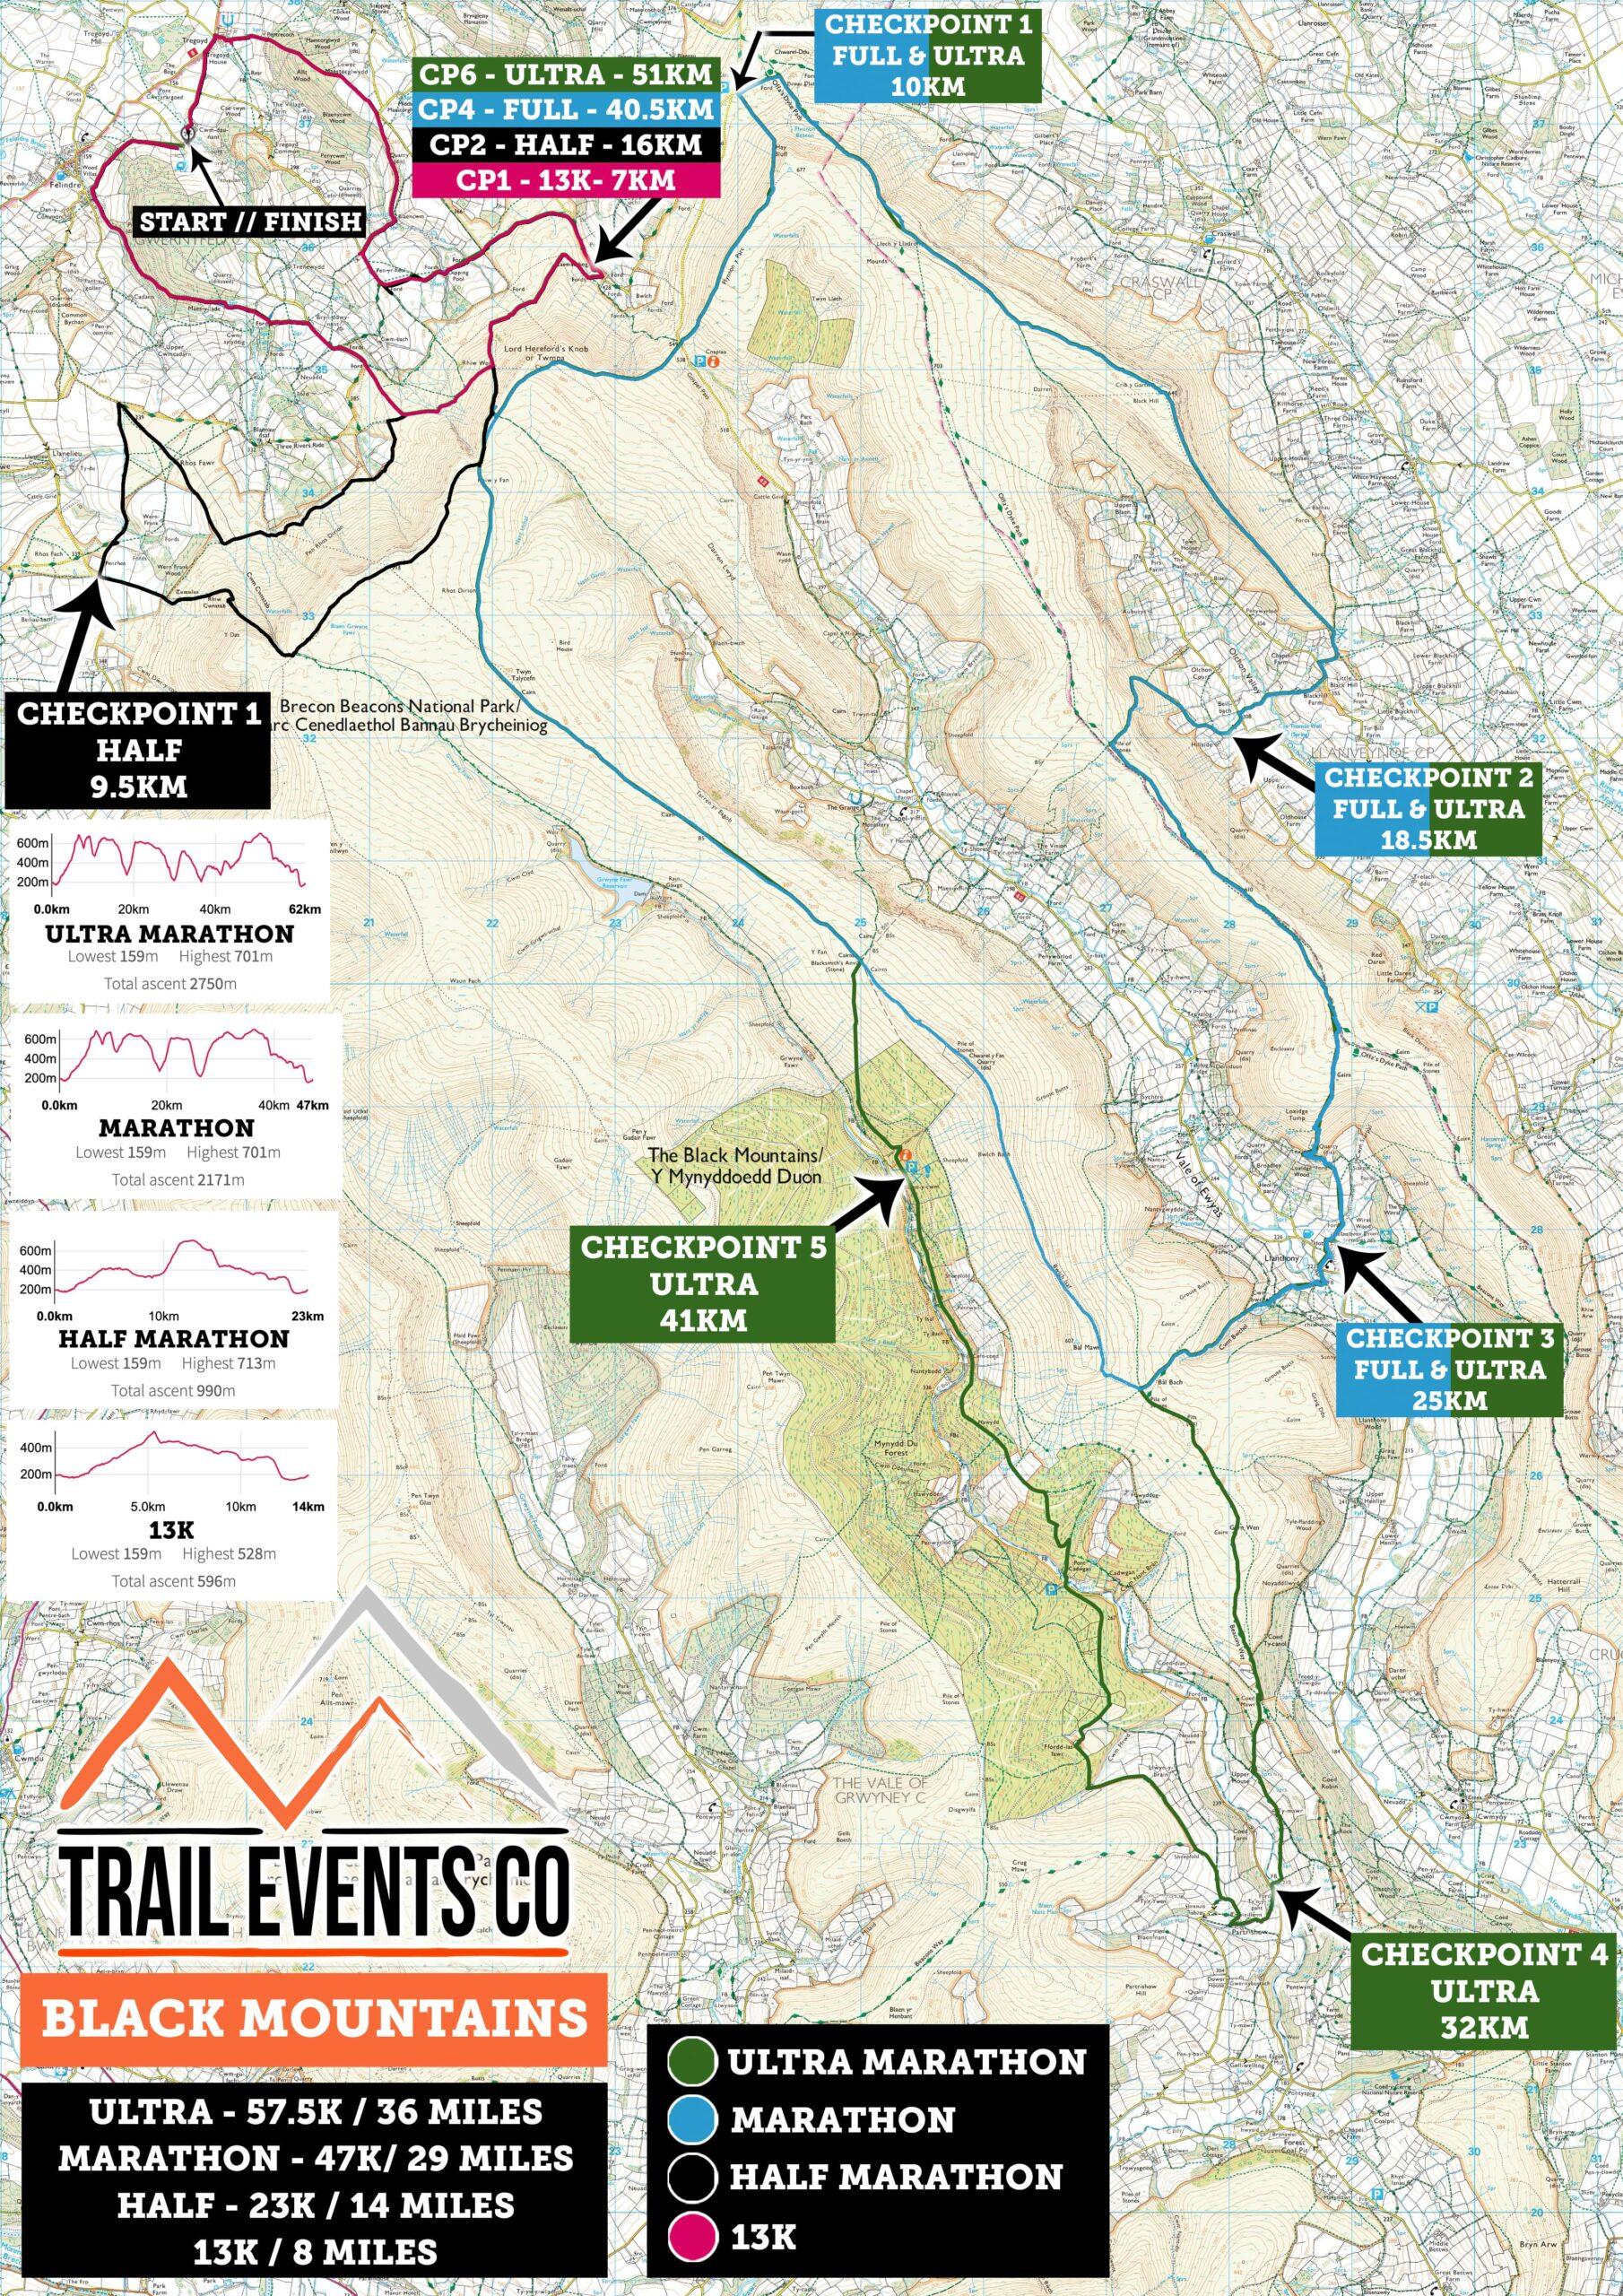 Black Mountains Trail Running Challenge